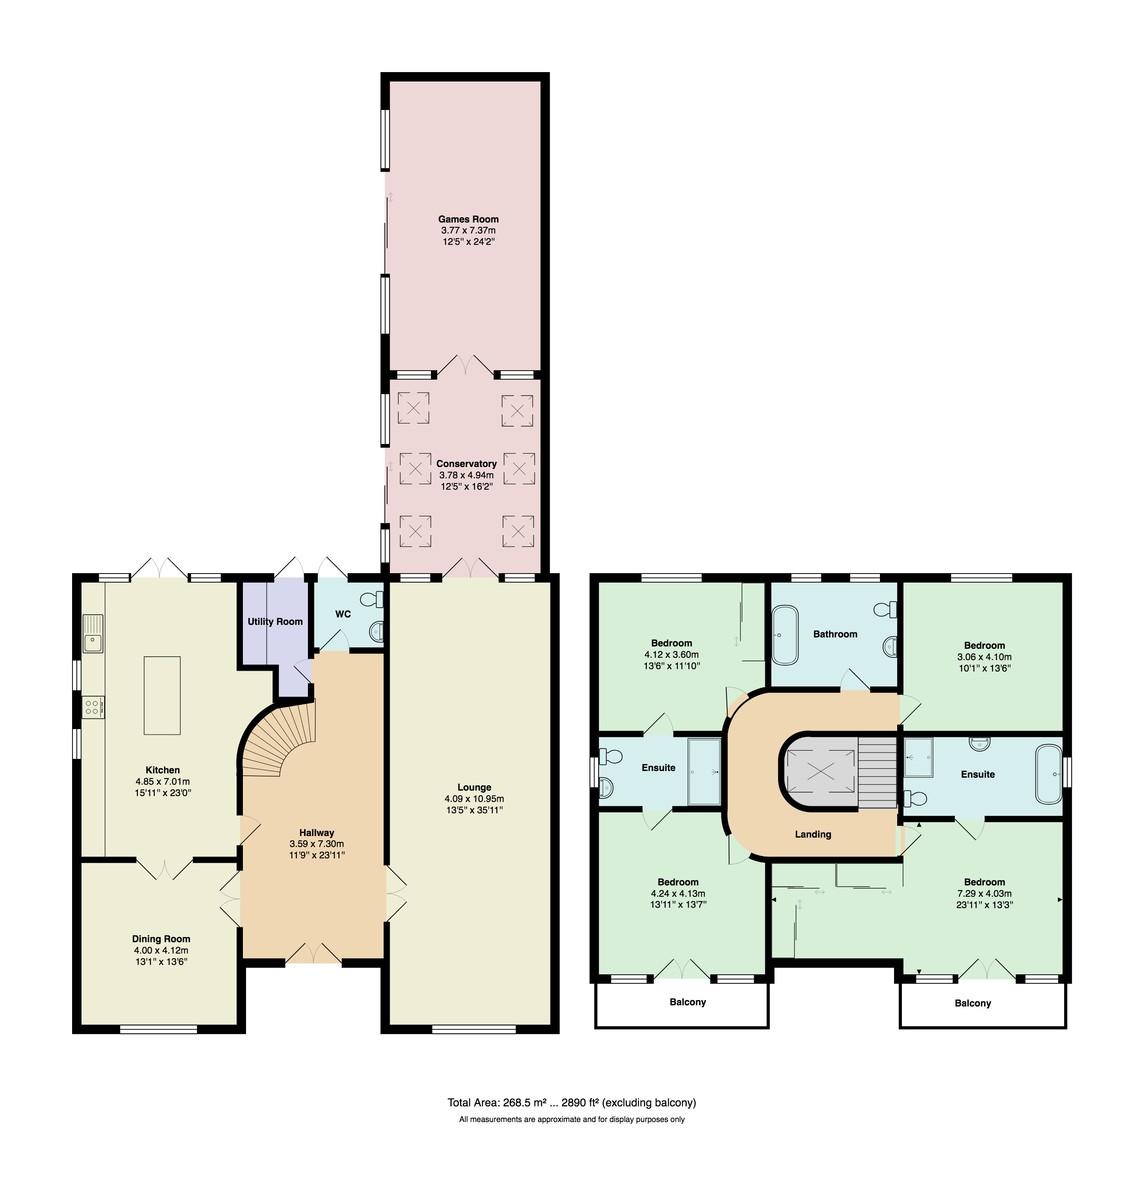 Carbery Avenue, Southbourne floorplan